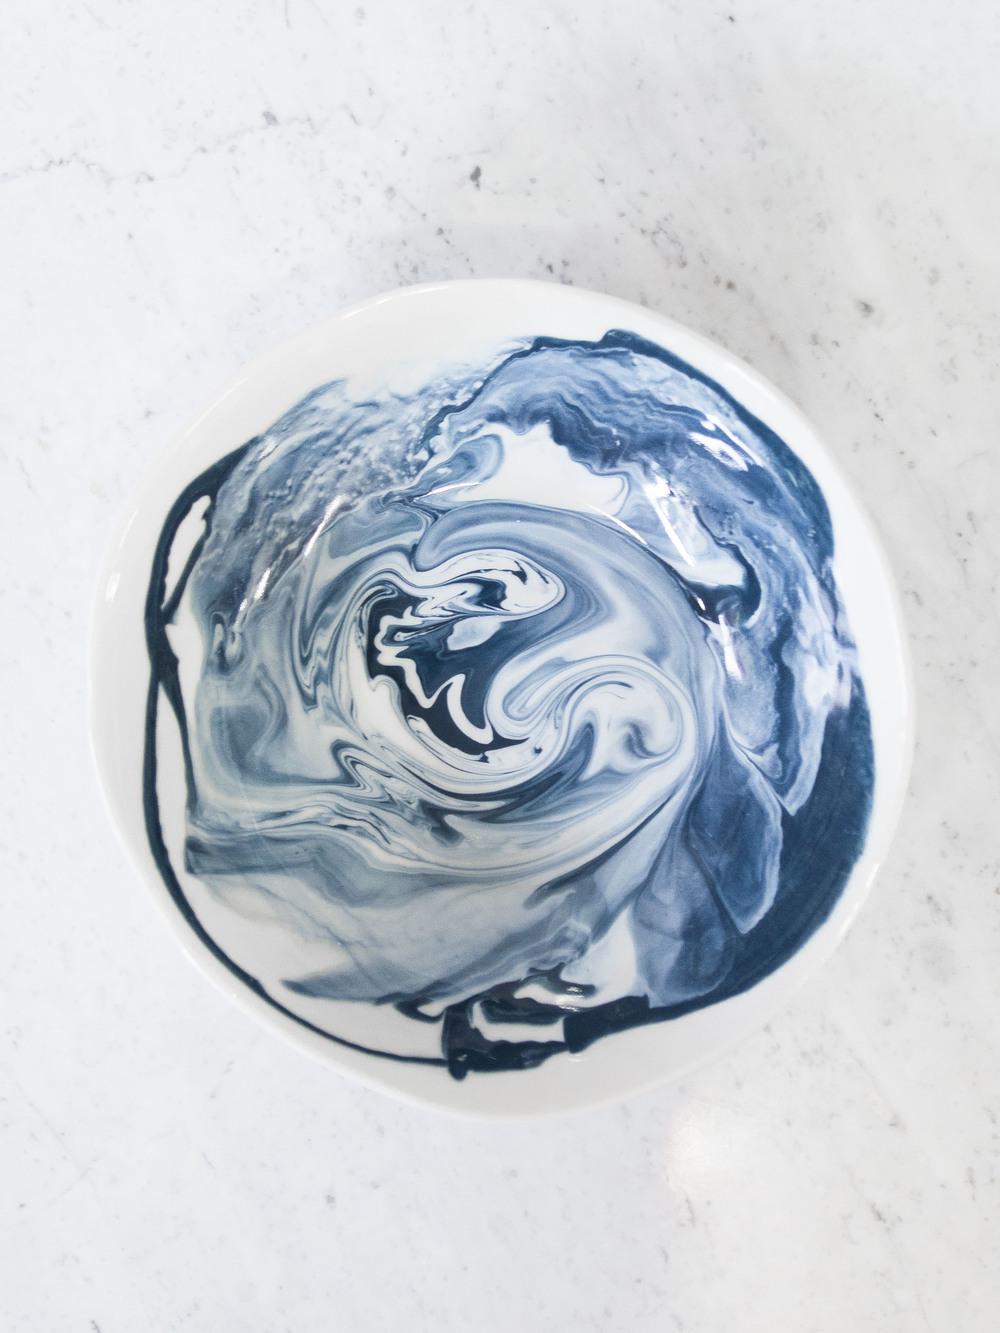 milly-dent-barrel-bowl.jpg